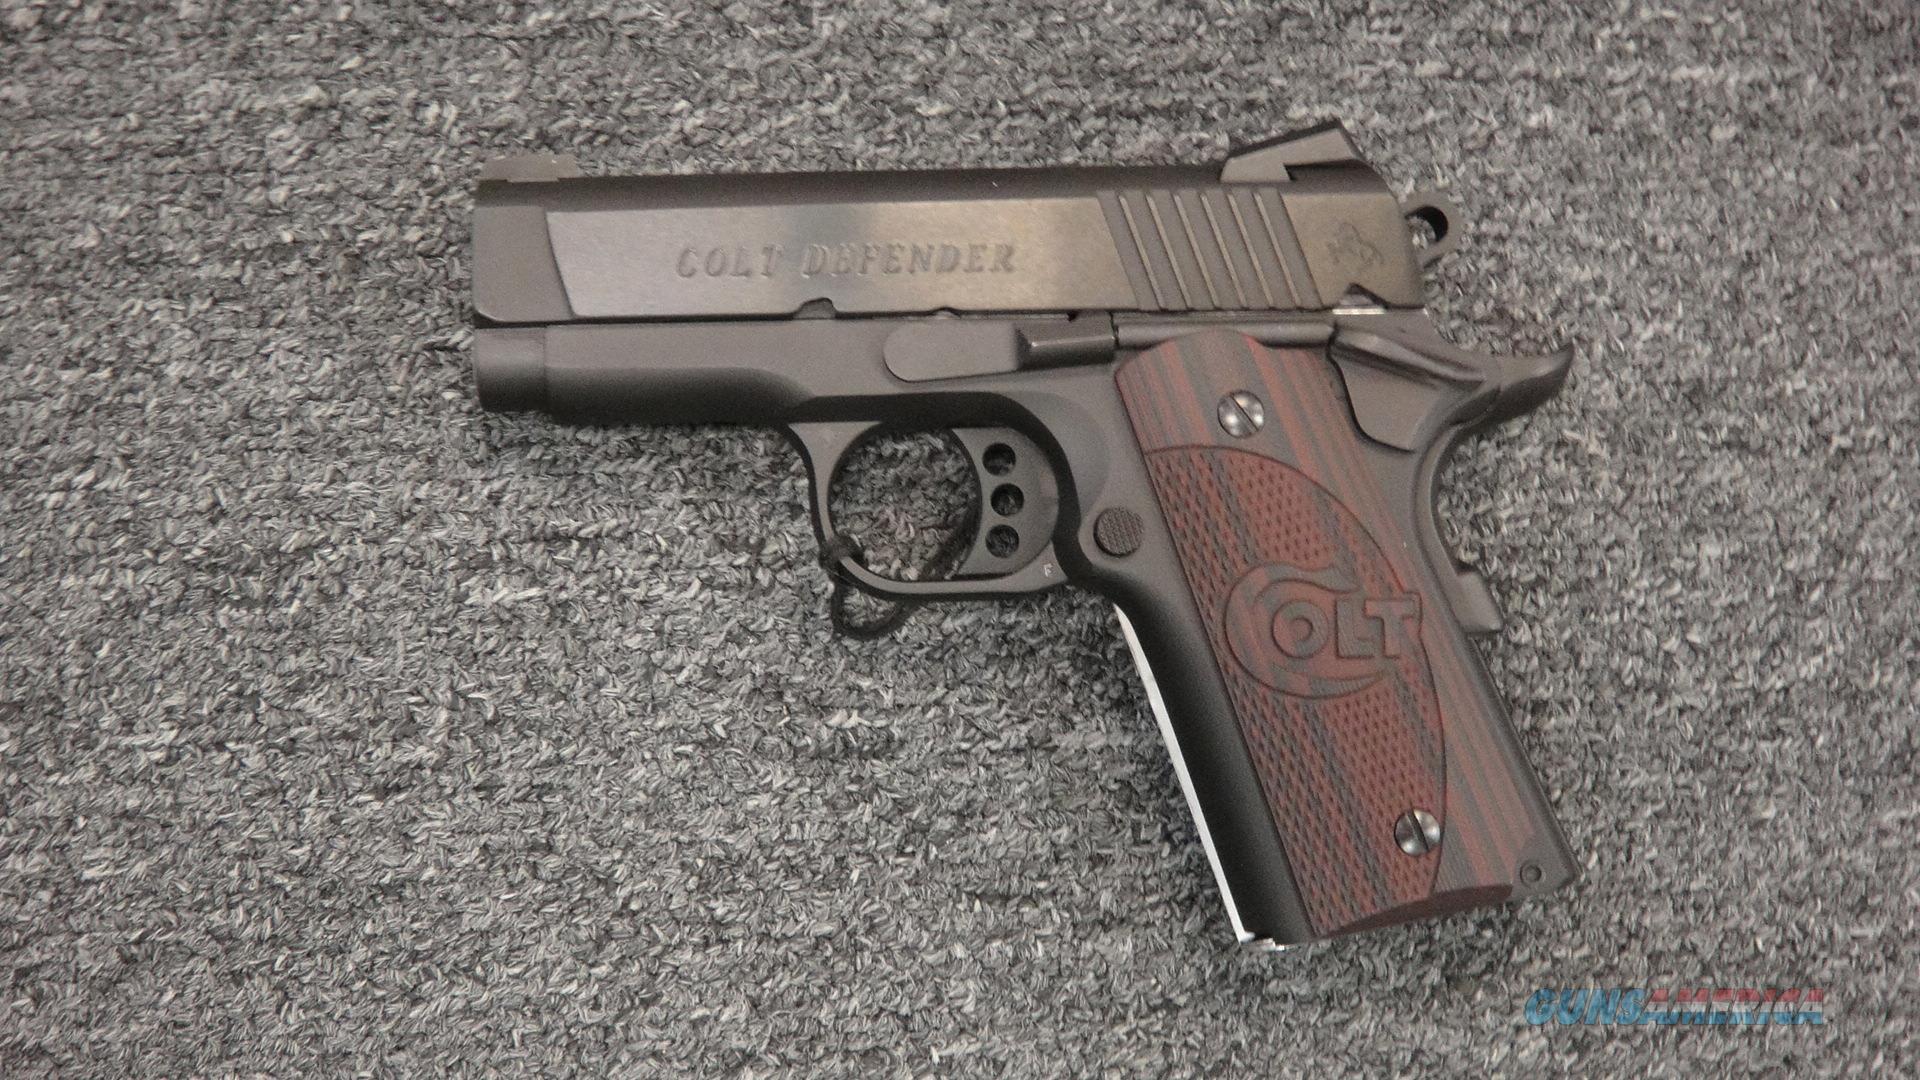 Colt Defender Lightweight 1911 .45ACP  Guns > Pistols > Colt Automatic Pistols (1911 & Var)